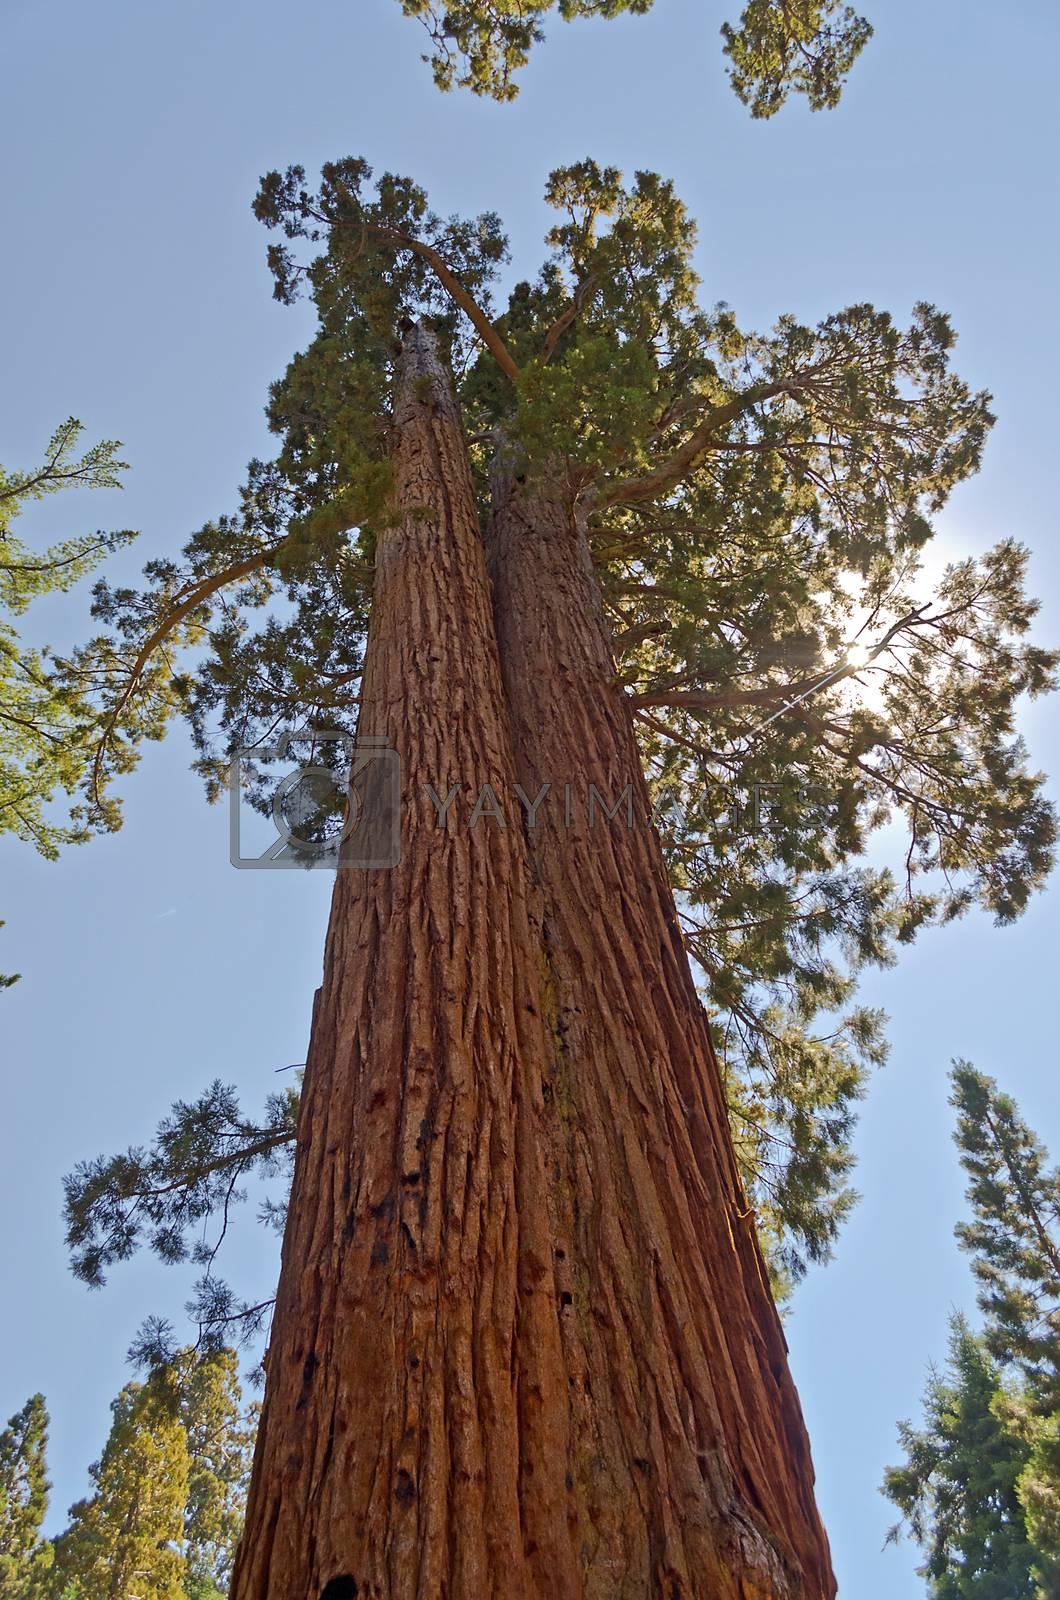 Giant Sequoias, Mariposa Grove in Yosemite National Park, California, USA